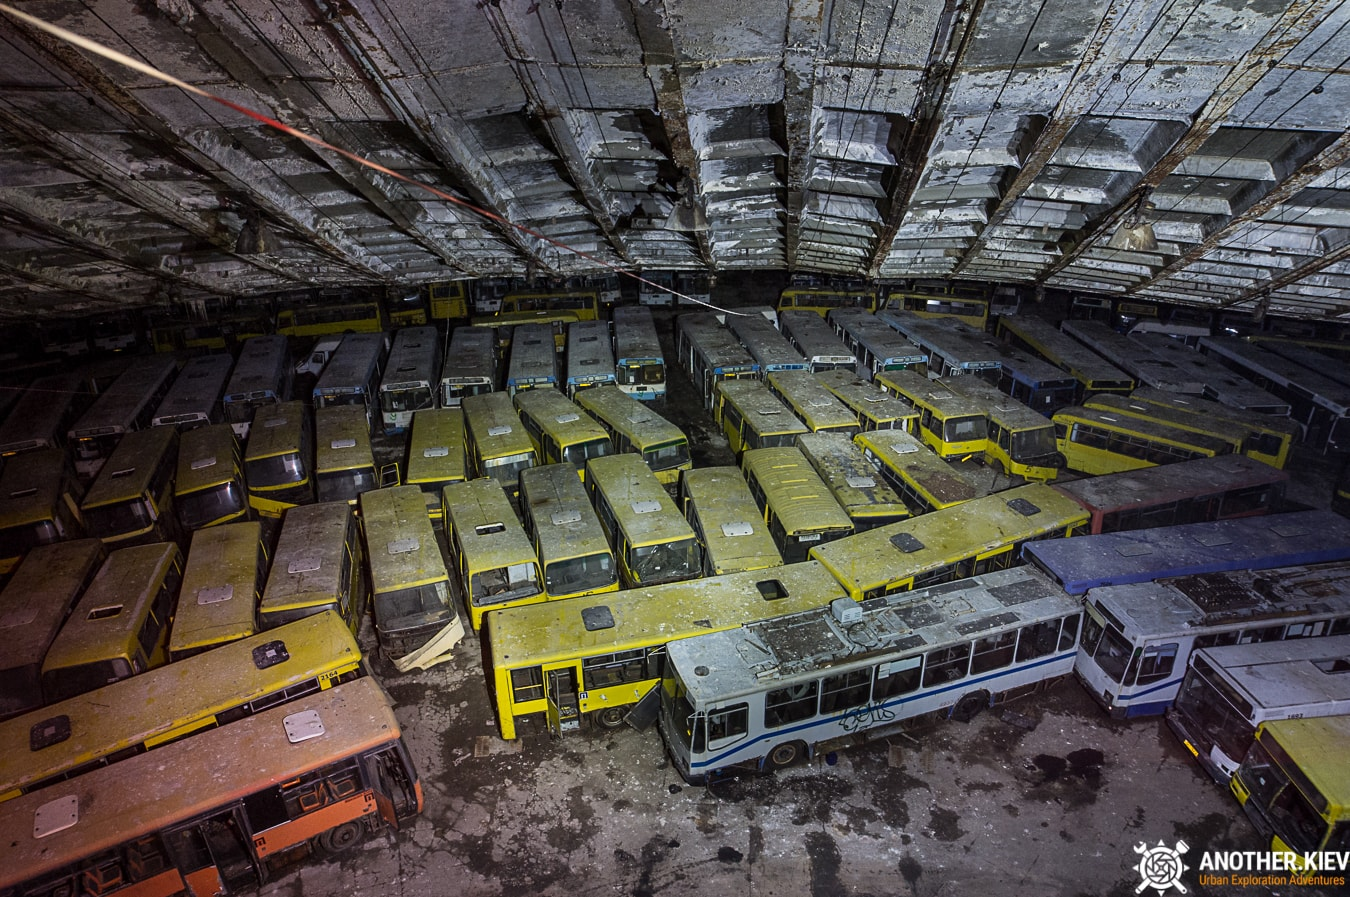 bus-graveyard-kiev-6770-min EXPLORING ABANDONED BUS GRAVEYARD IN KIEV